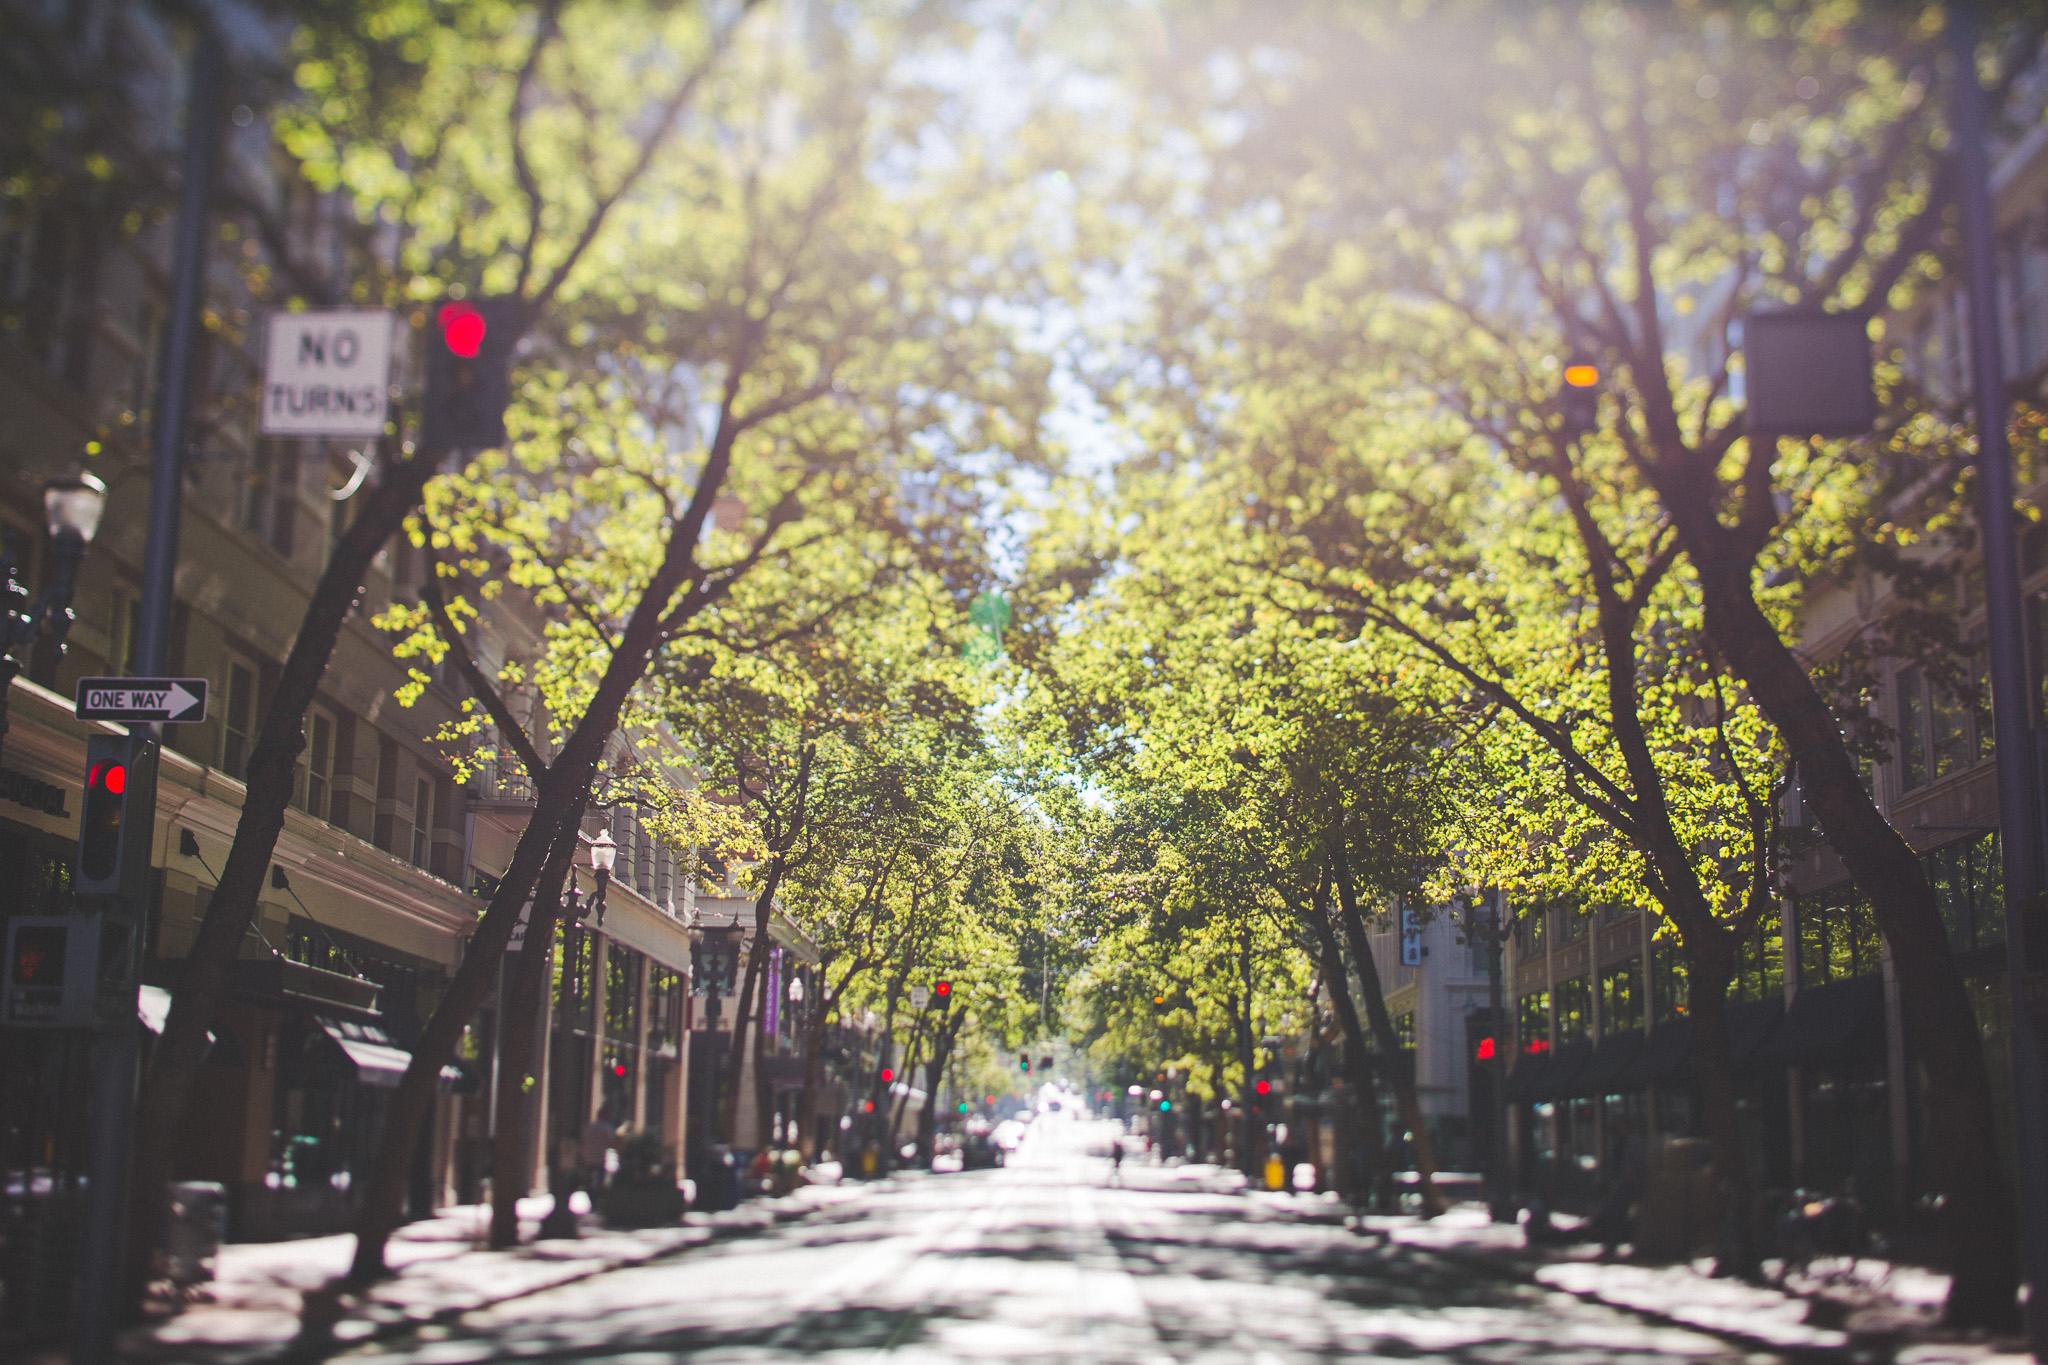 streets-of-portland